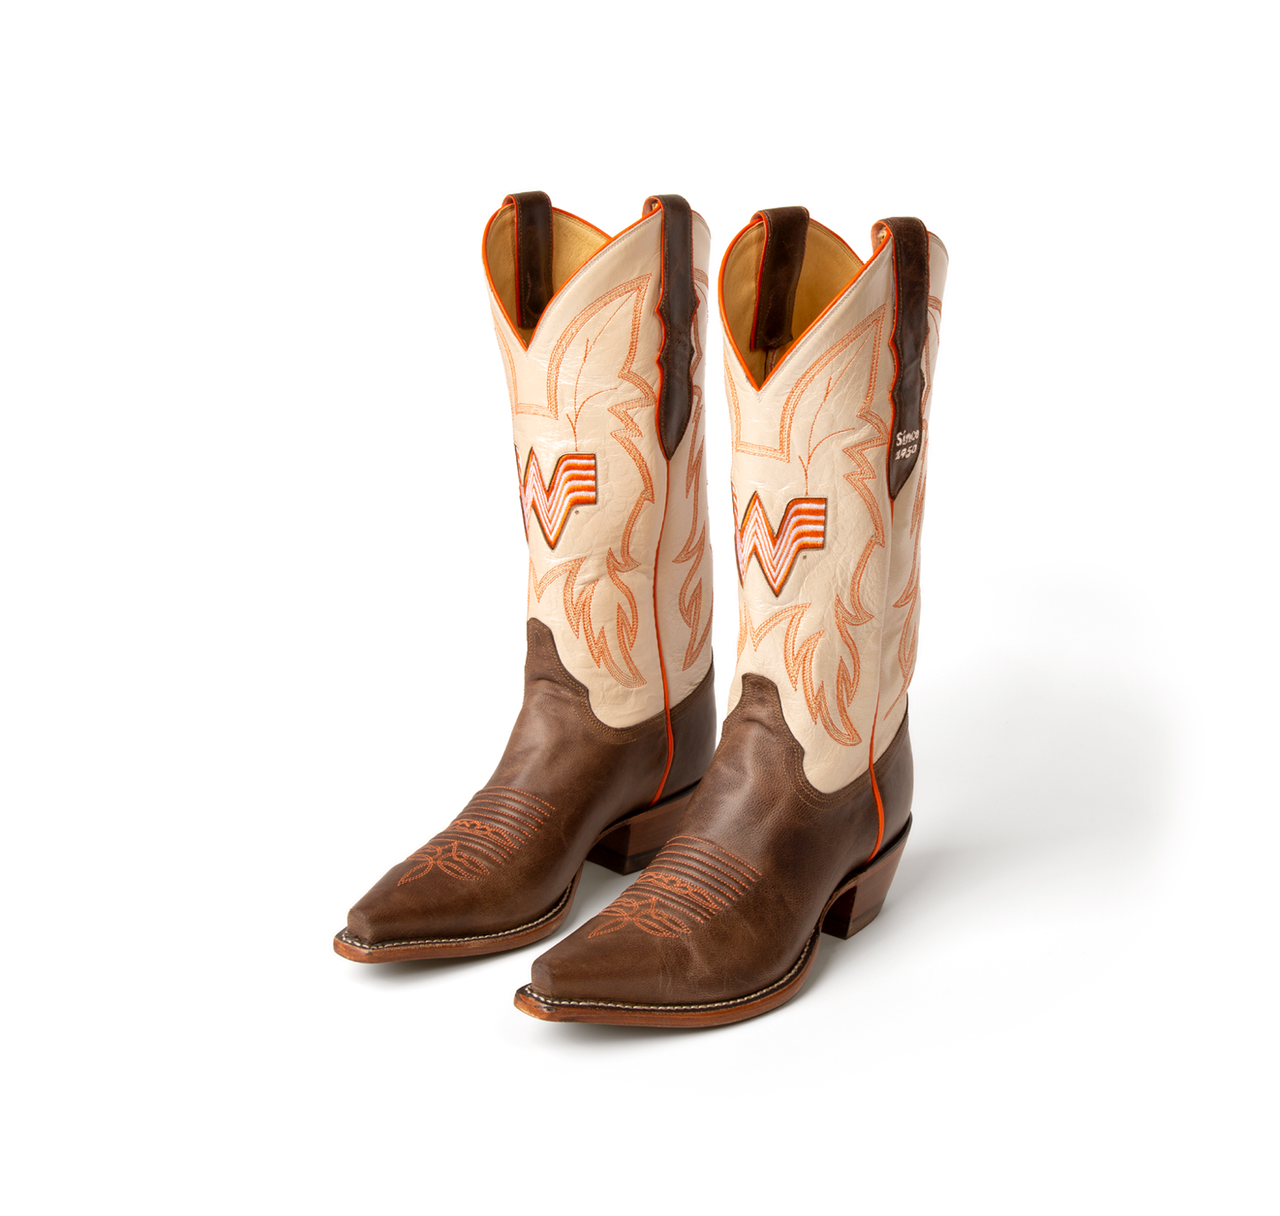 Whataburger's cowboy boots